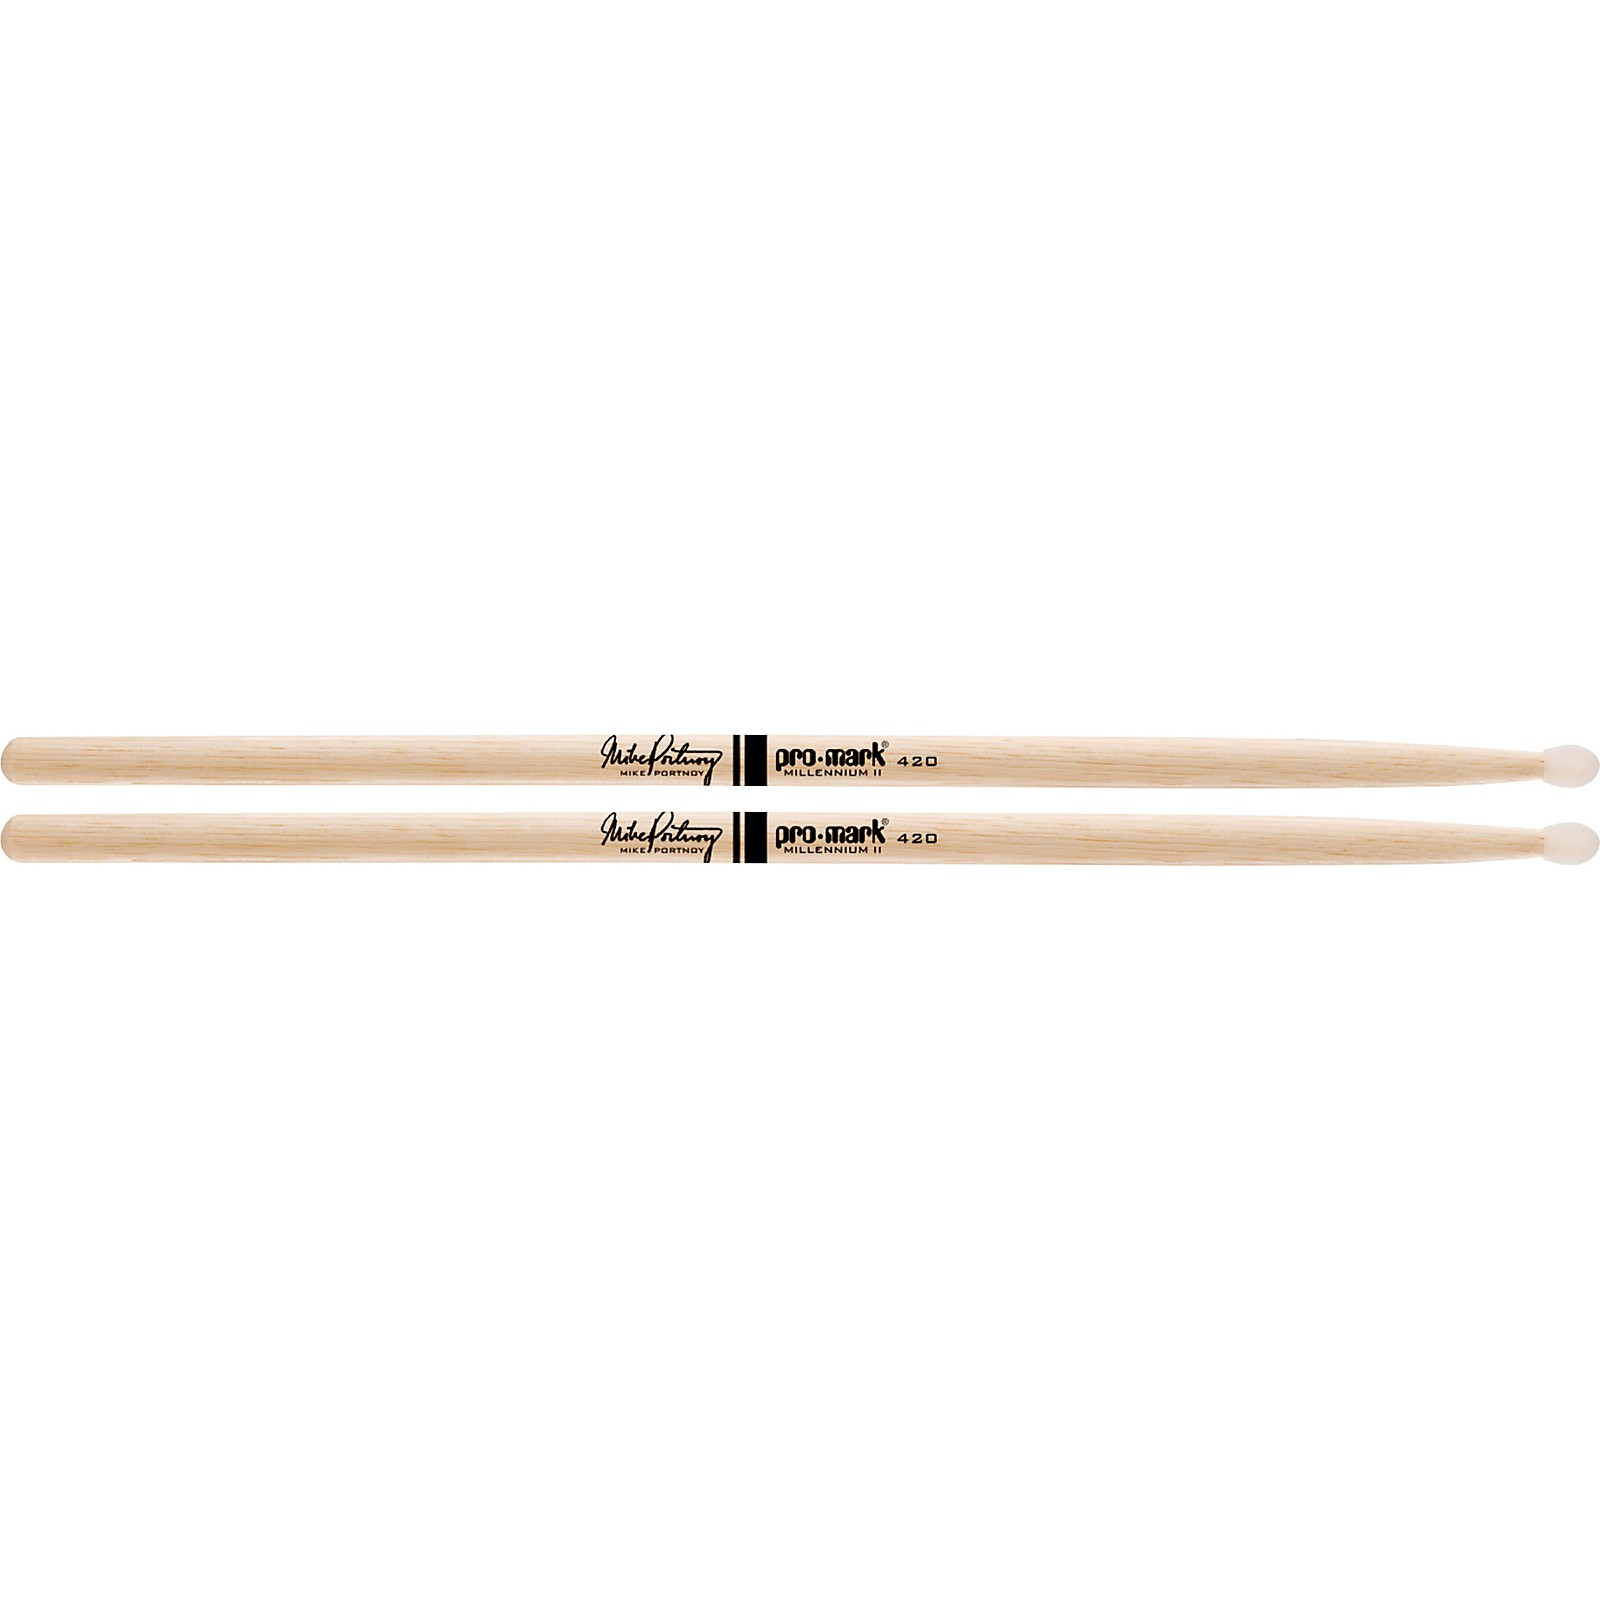 Promark Mike Portnoy Autograph Series Drum Sticks